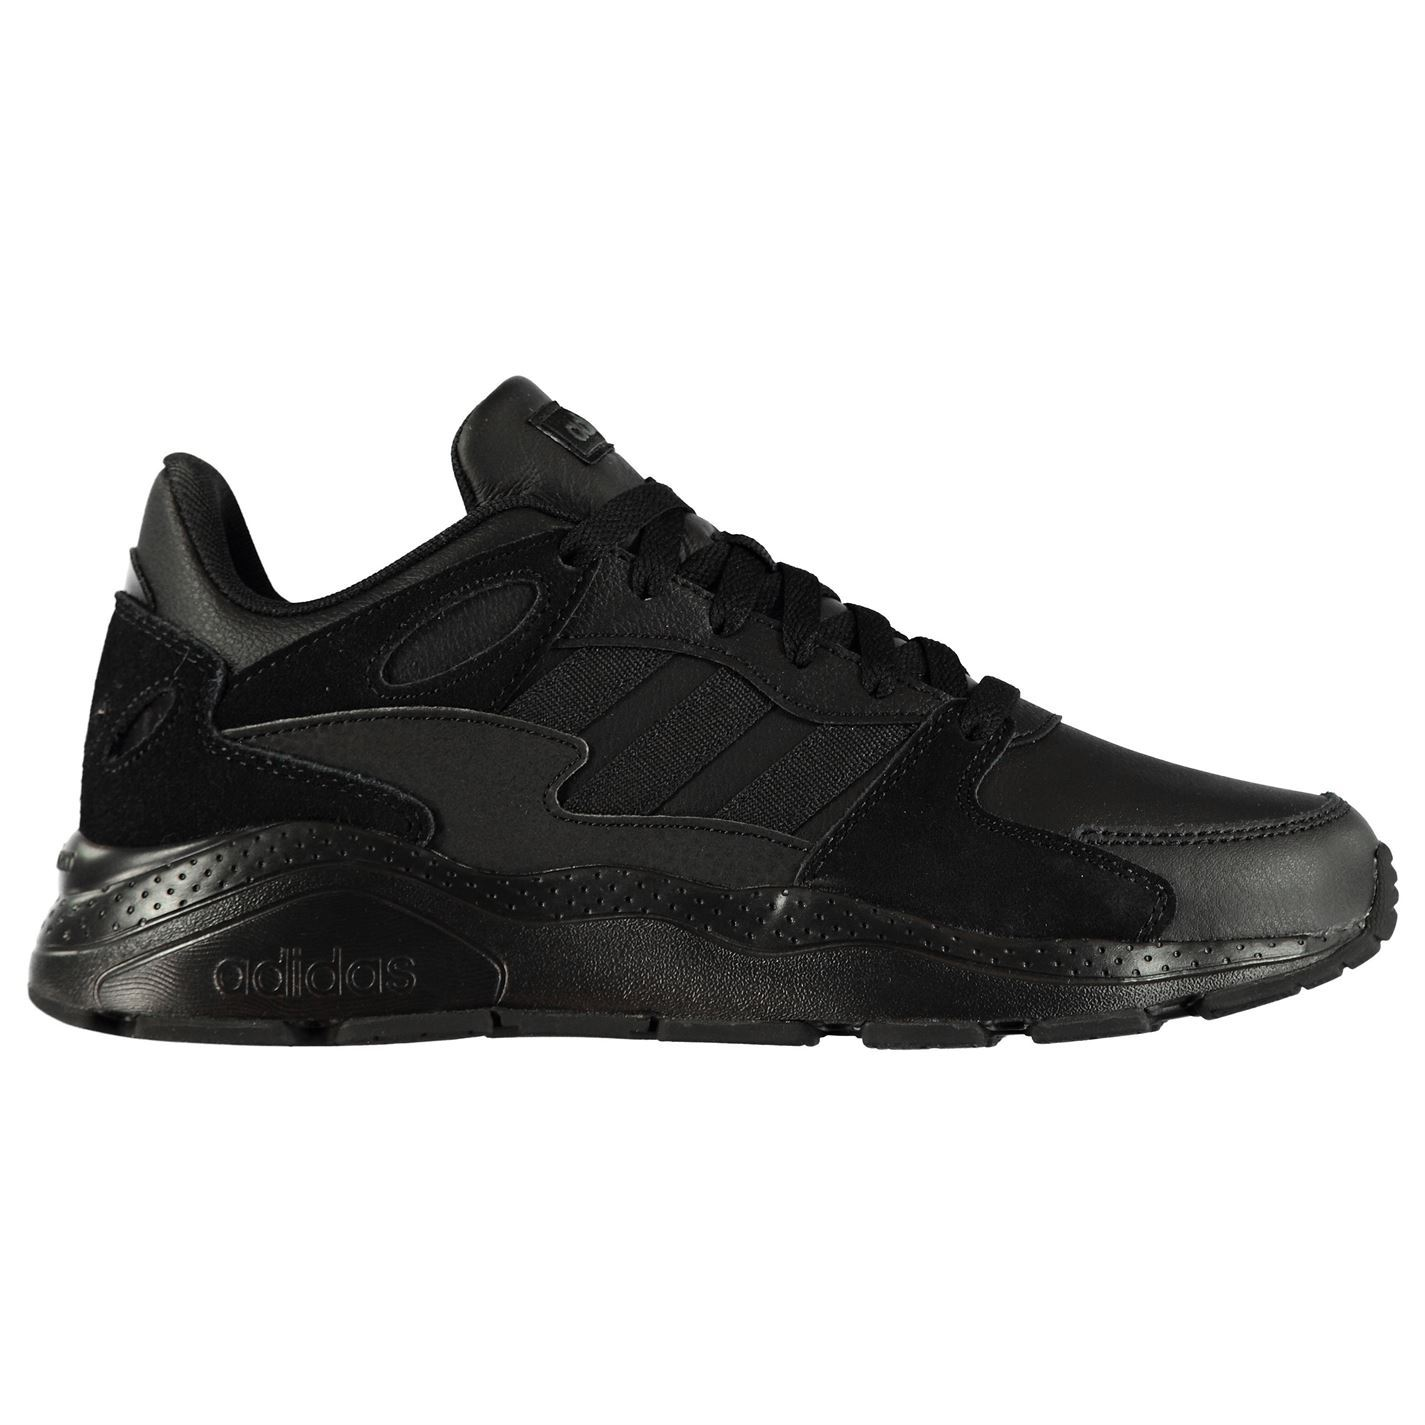 Adidas-Crazychaos-Baskets-Homme-Chaussures-De-Loisirs-Chaussures-Baskets miniature 8